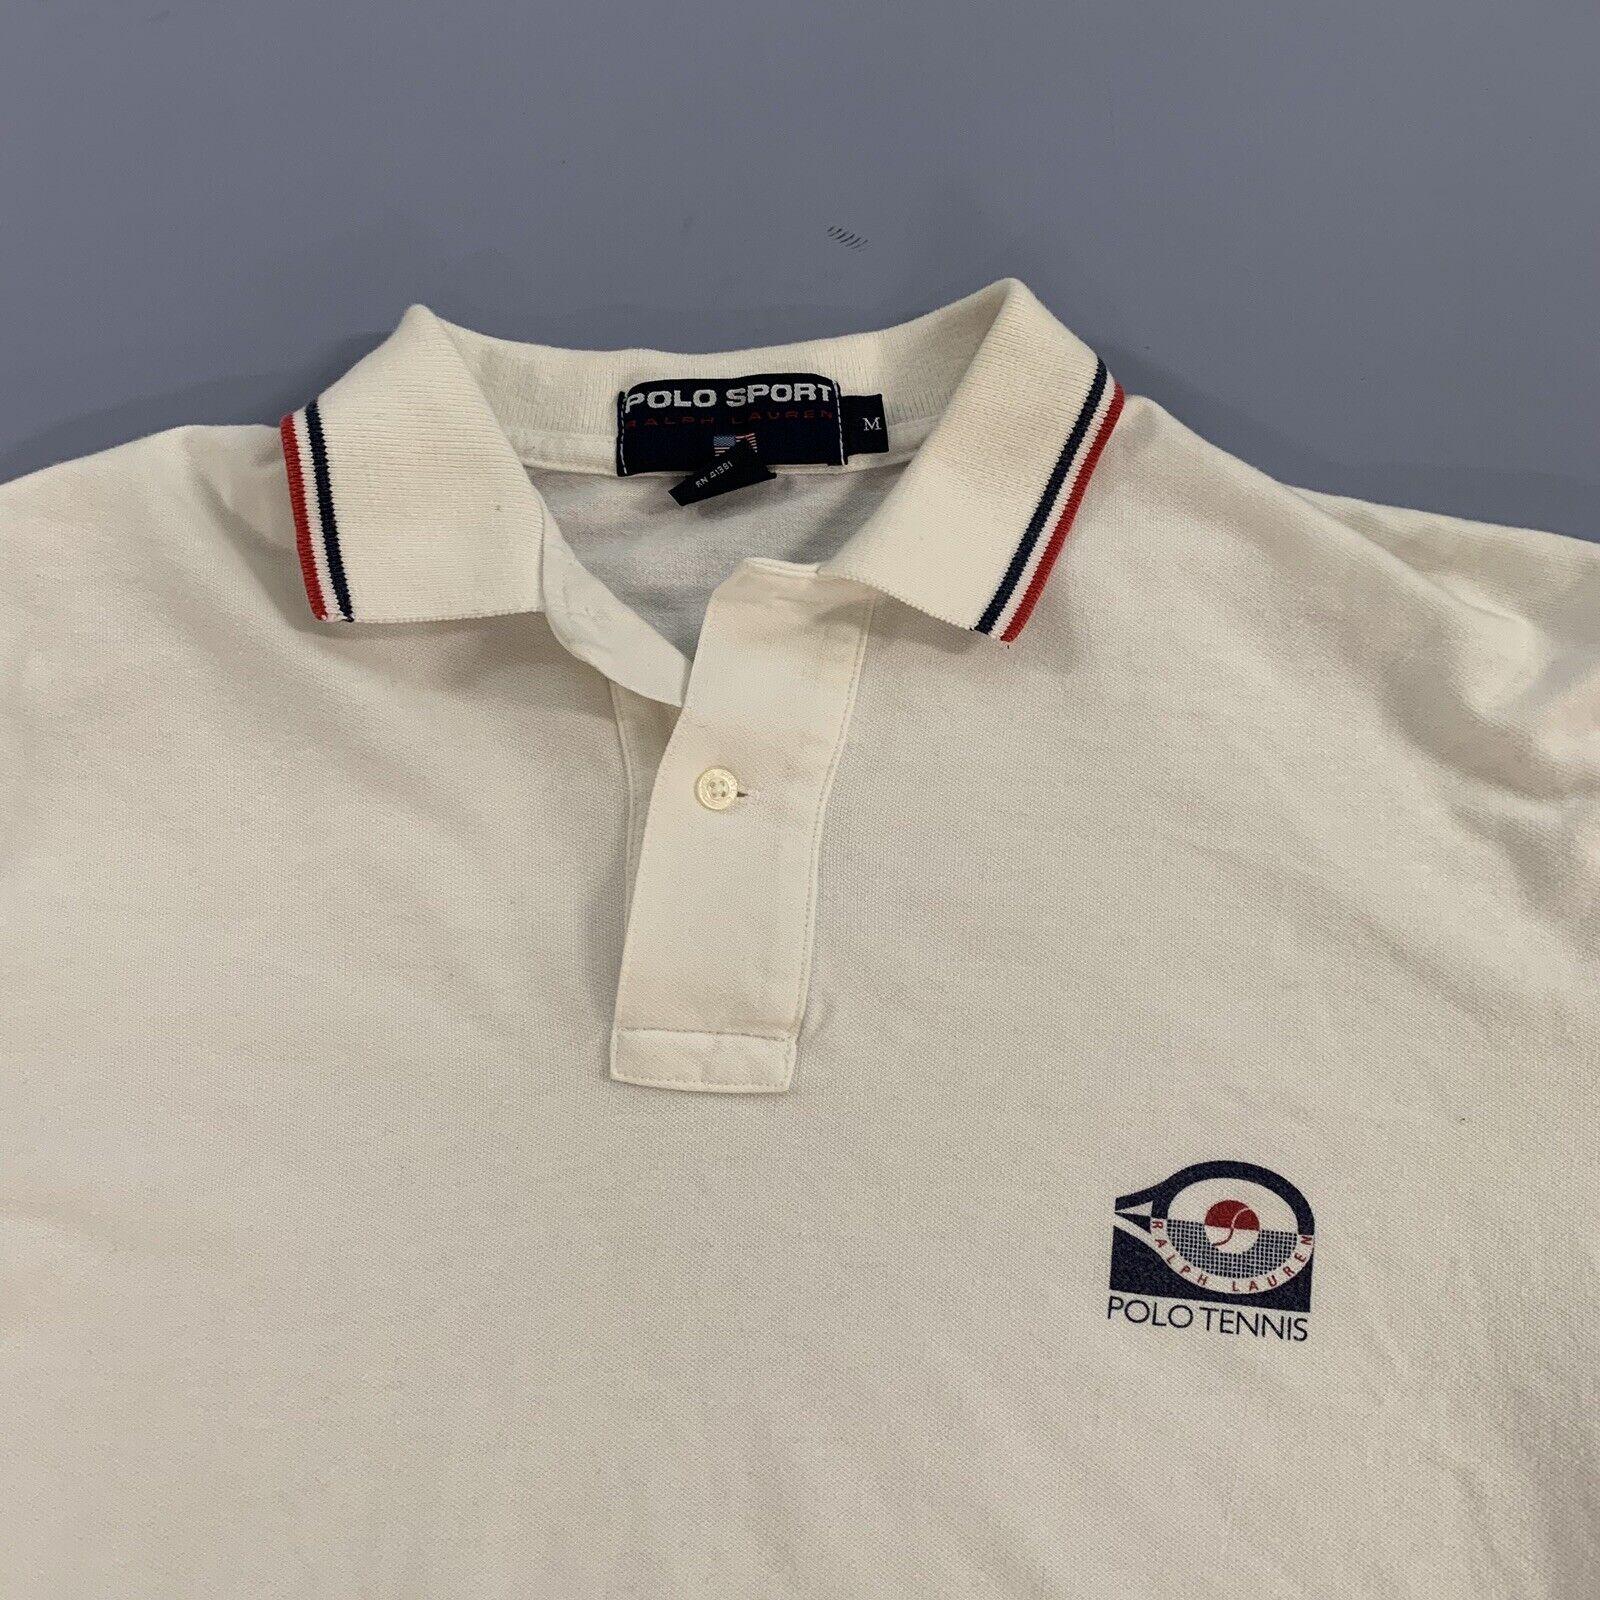 Vtg 80s 90s Polo Sport Tennis Shirt Single Stitch… - image 1